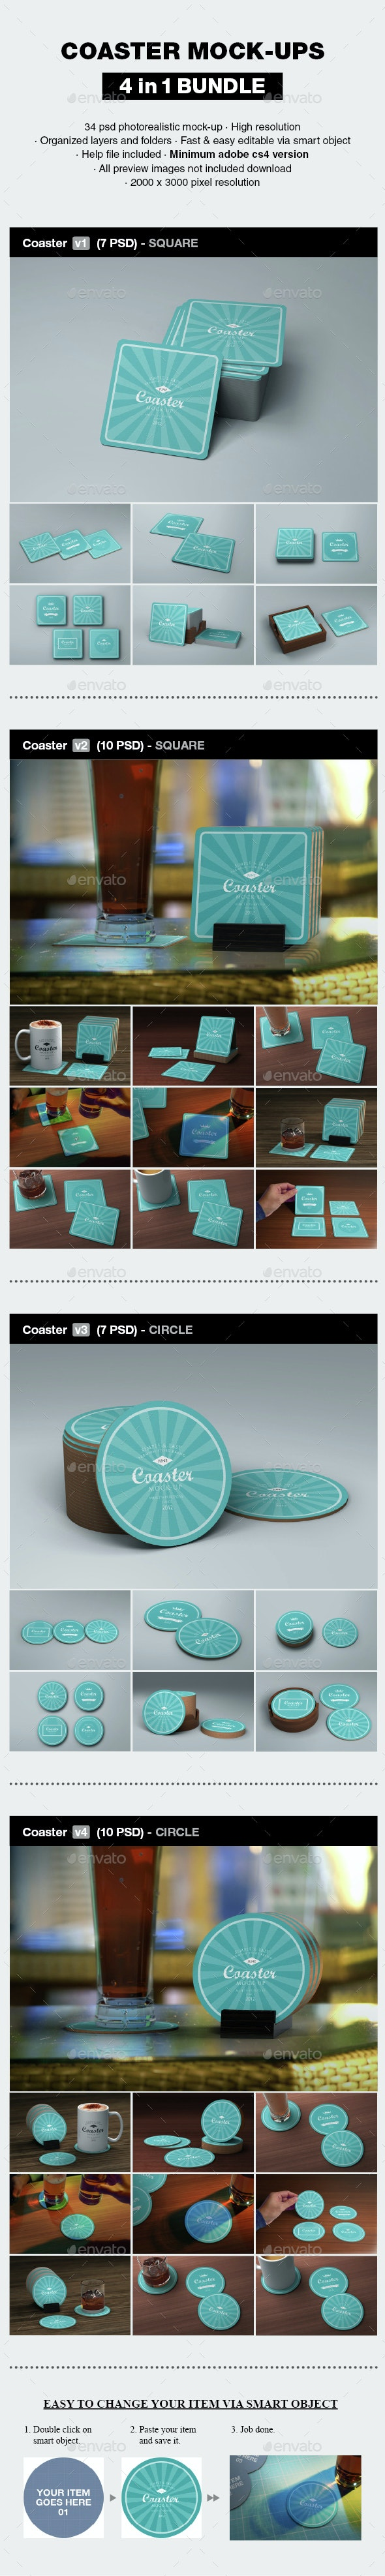 Coaster Mock-up Bundle - Print Product Mock-Ups